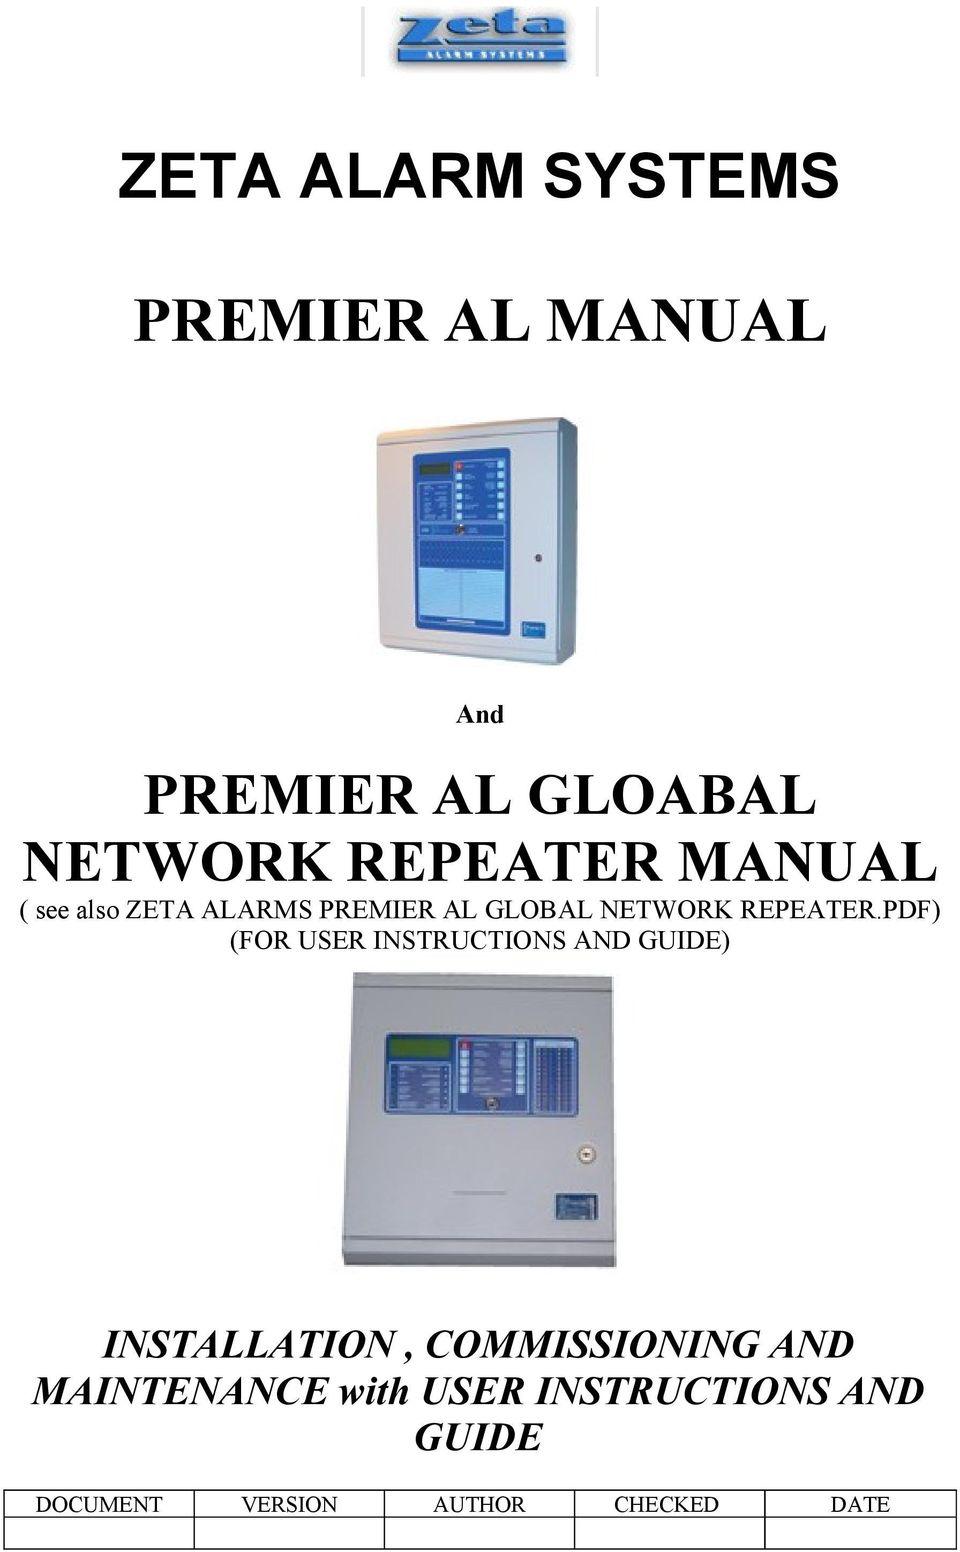 hight resolution of zeta addressable fire alarm system wiring diagram zeta alarm systems premier al manual pdfrh